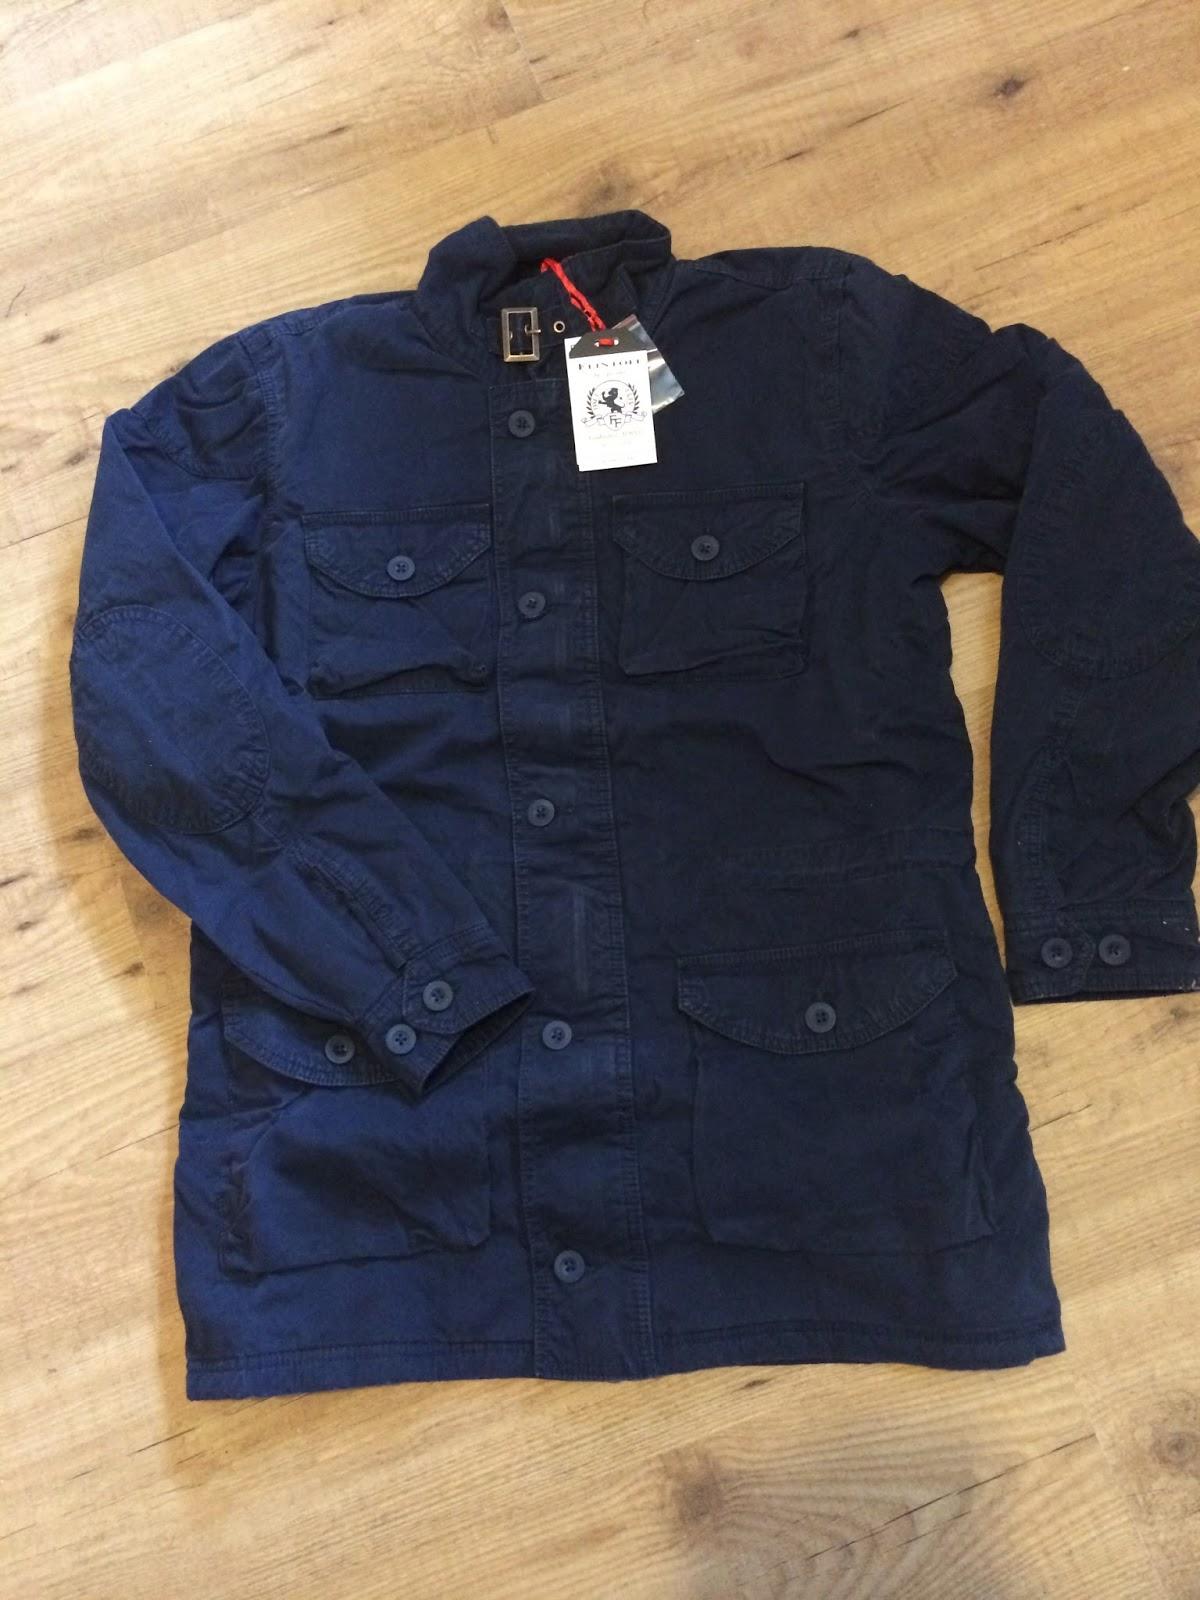 navy military jacket from Flintoff by Jacamo